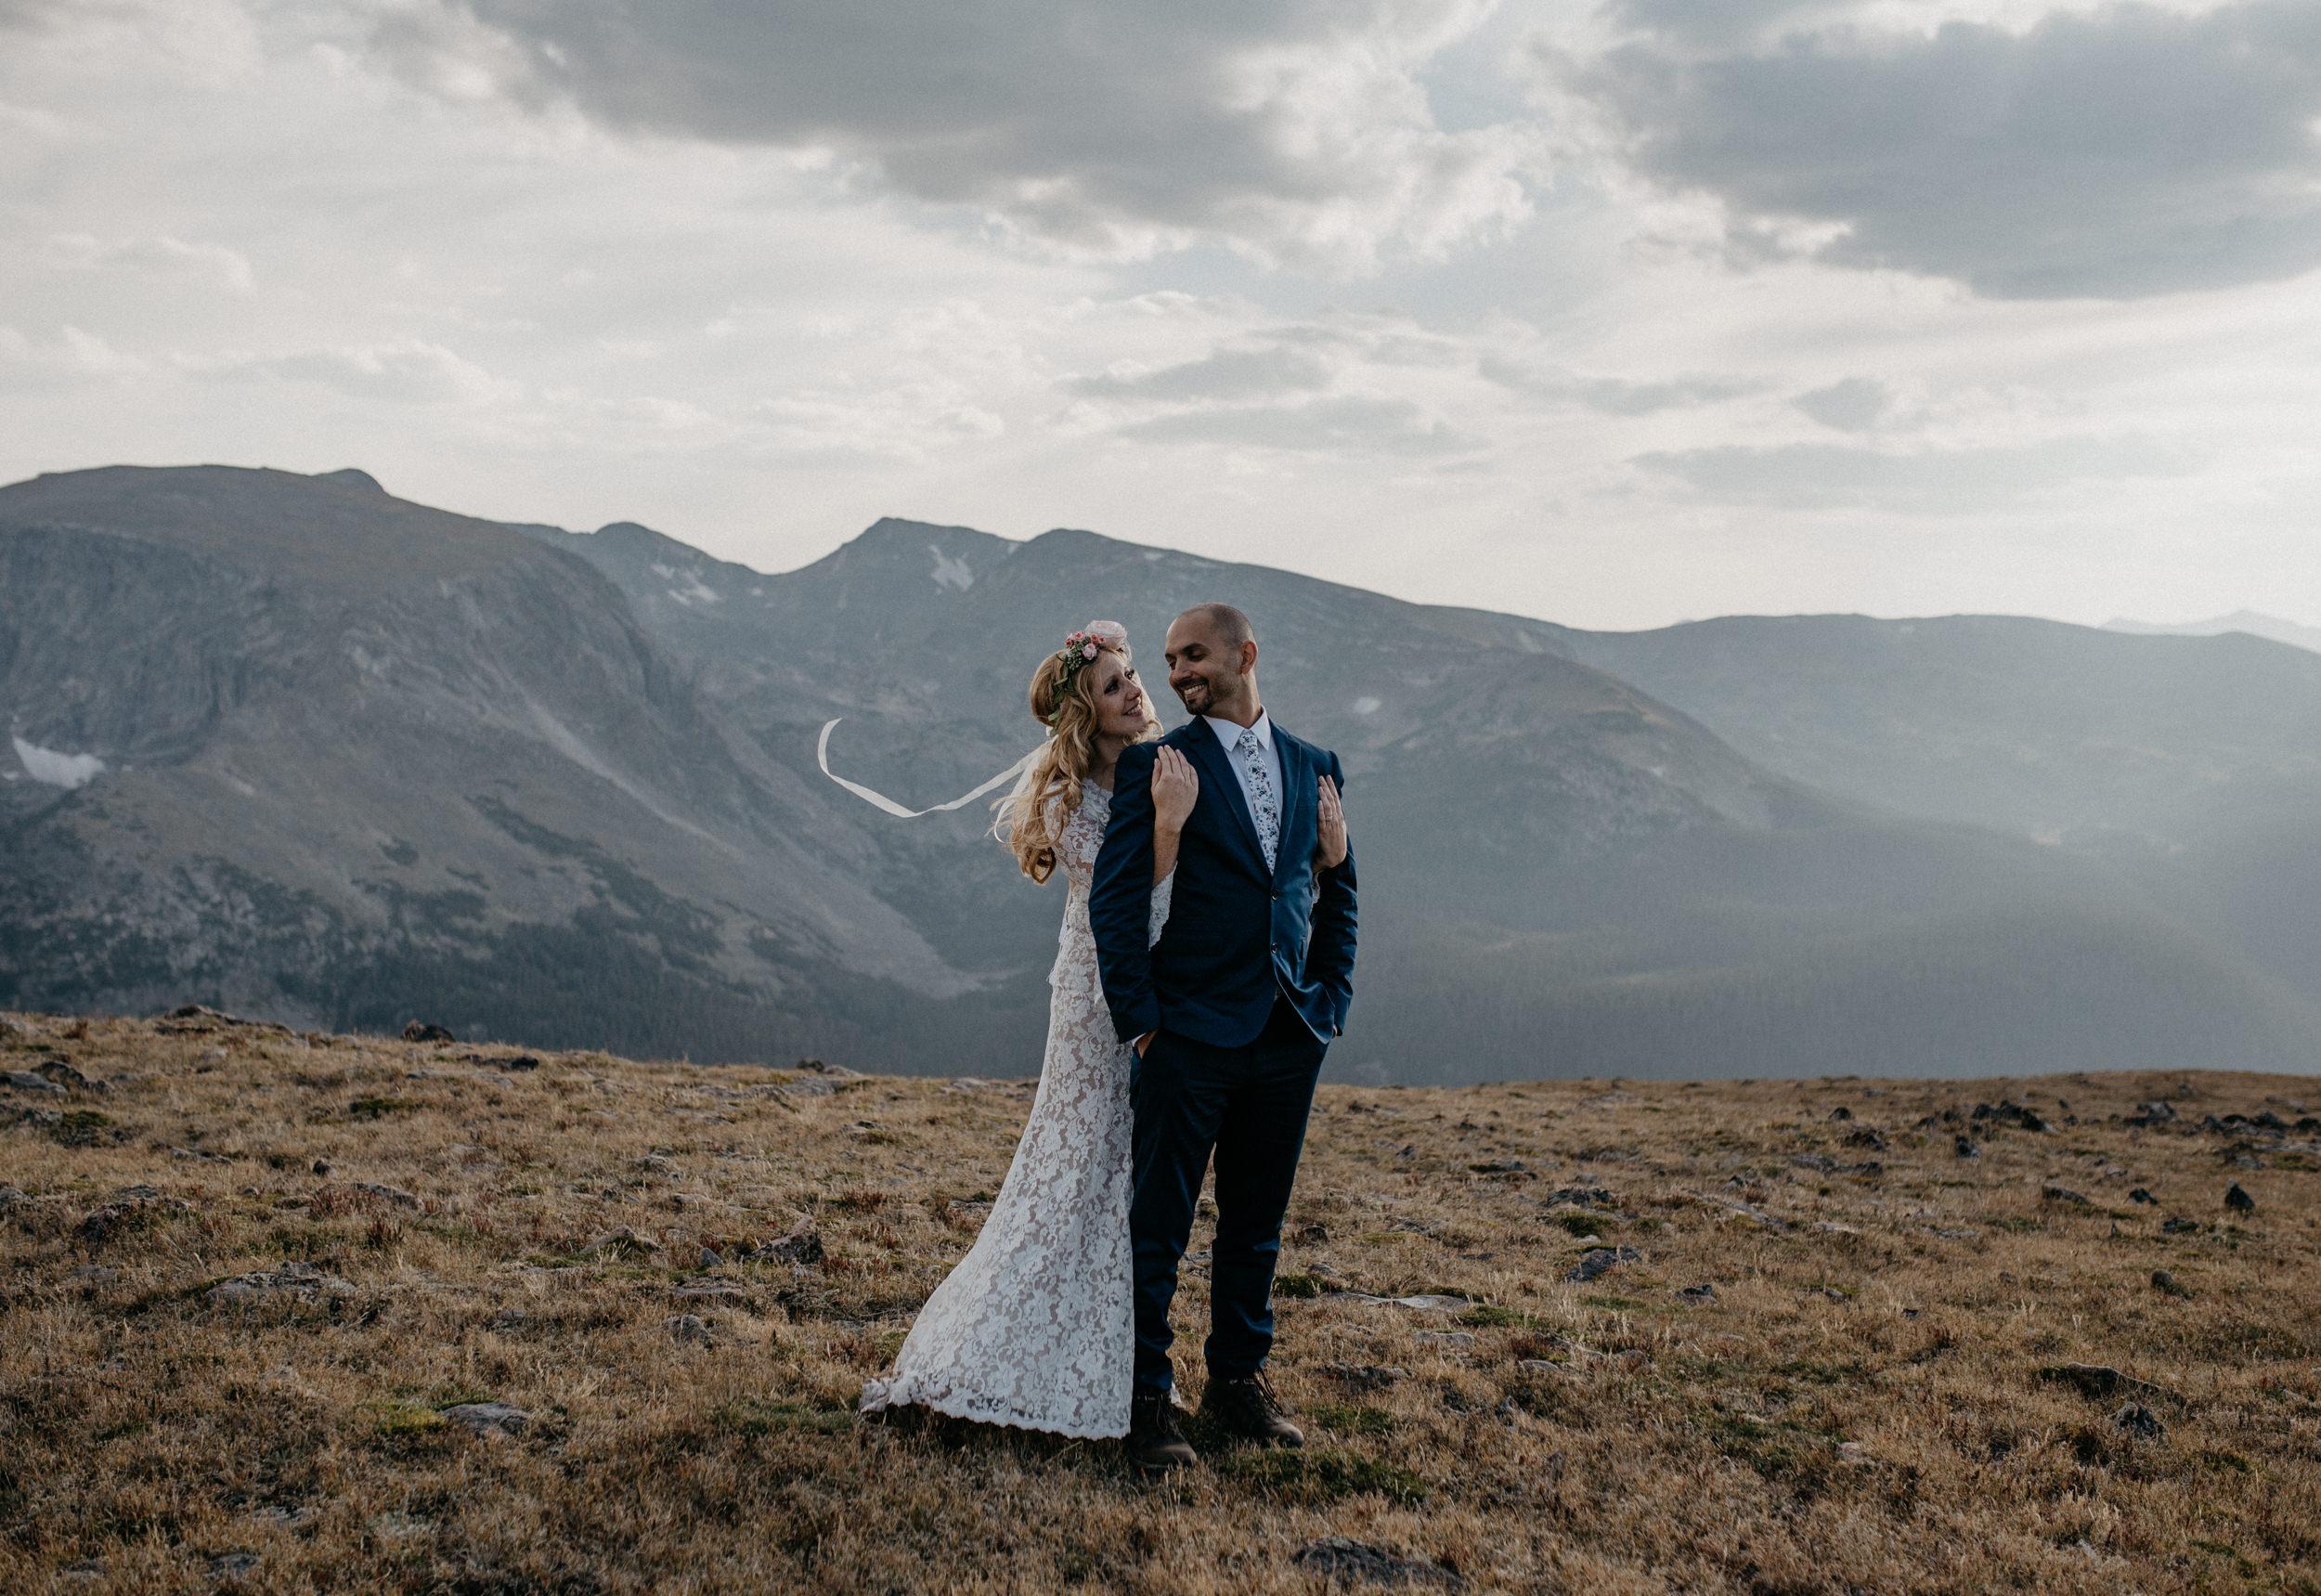 Trail Ridge Road adventure elopement. Colorado elopement and wedding photographer.